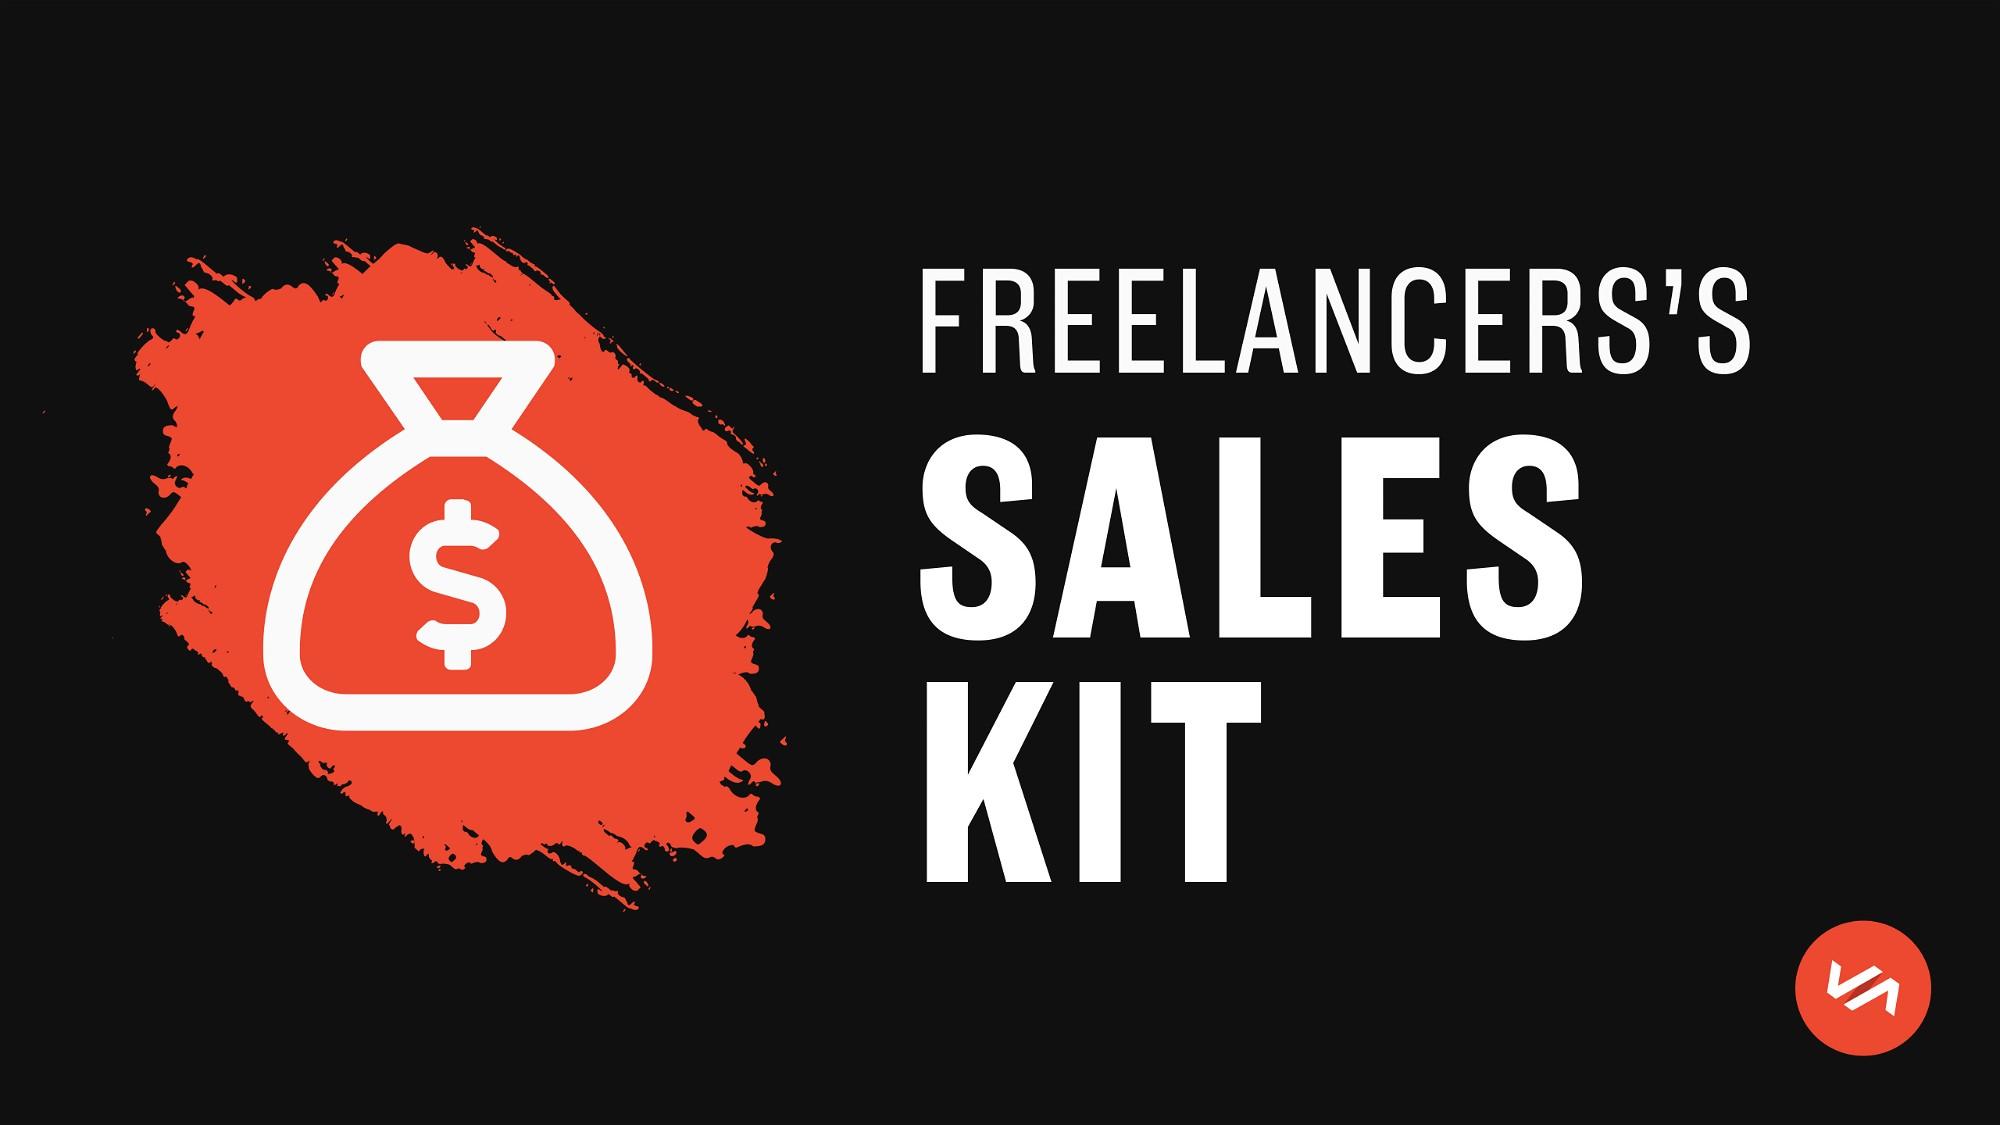 AppSumo Deal for Freelancer's Sales Kit